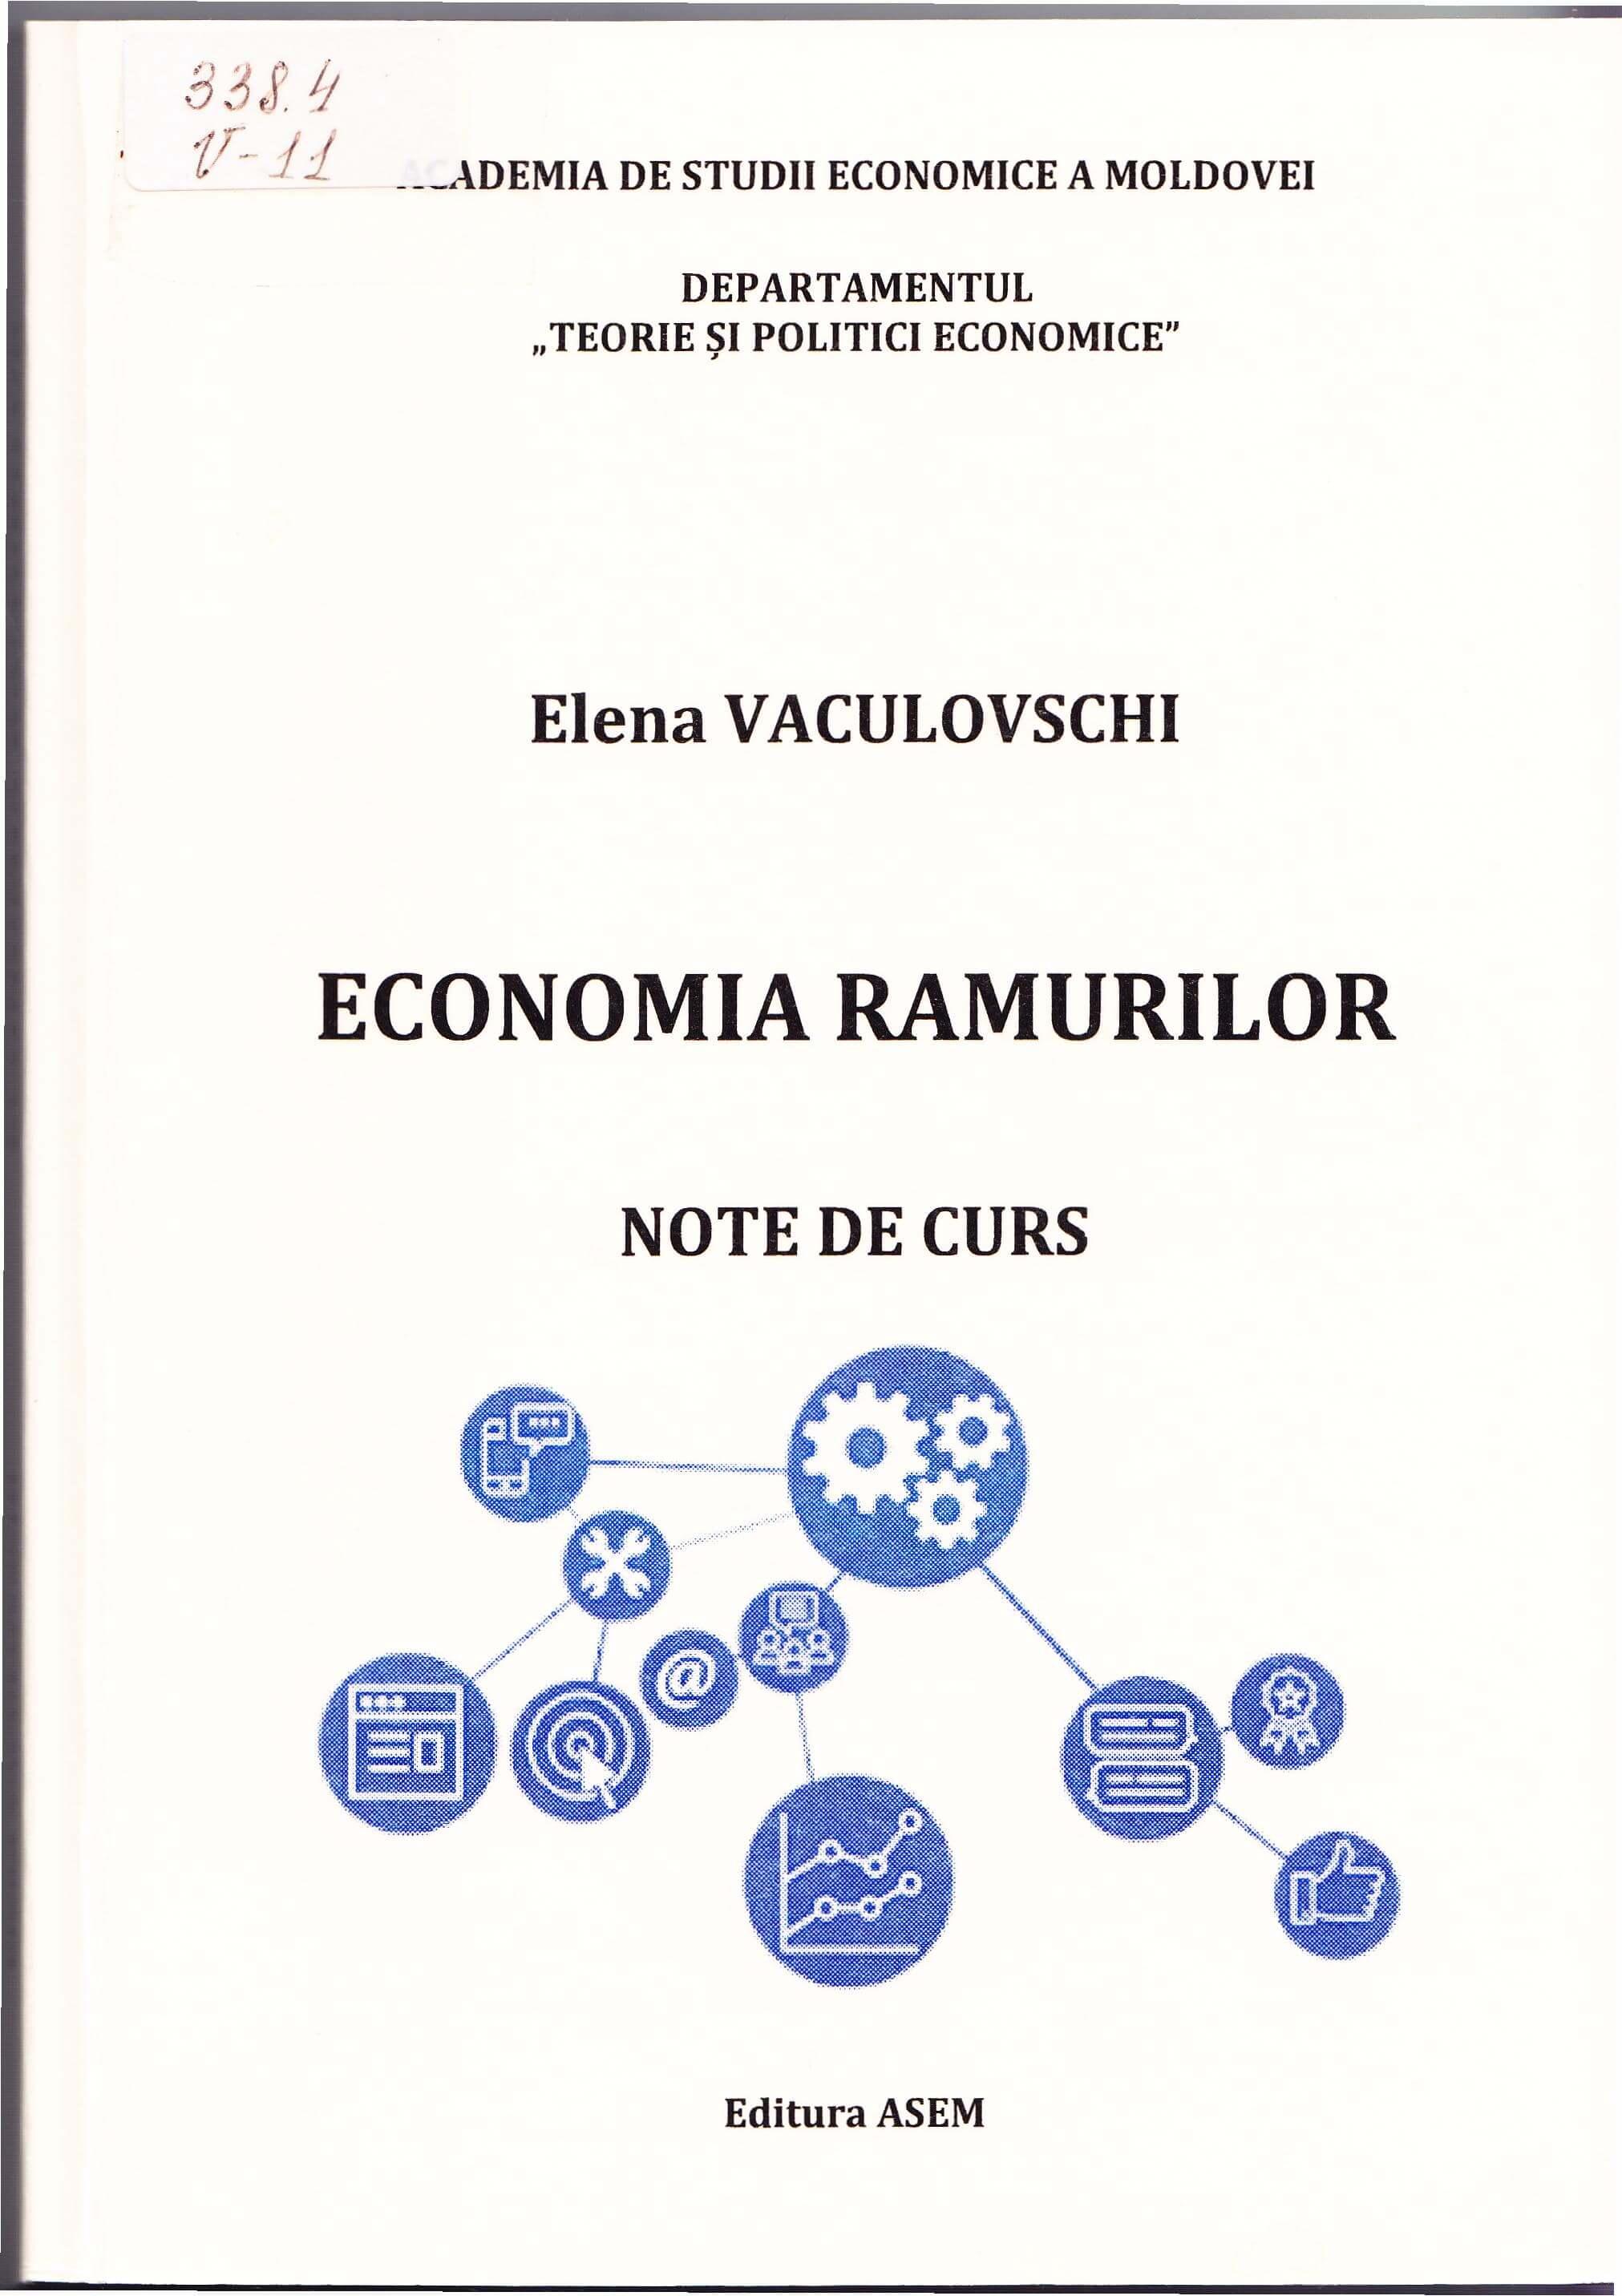 "Titlu:  Economia ramurilor: Note de curs.<br /> Autor: Vaculovschi Elena<br /> Locul, Chişinău: S. n., 2019<br /> Cota:  338.4, V-11<br /> Localizare:   Depozit Central (1 ex.), Sala de lectură Nr.1 (3 ex.), Împrumut (5 ex.)"" class=""slider_thumbnail full thumbel_slider_thumbnail"" width=""460″ height=""600″ style=""float:none;height:600px;border:0px solid #222;width:460px;margin:0;padding:0;"" title =""Economia ramurilor: Note de curs."" /></a> <div class="